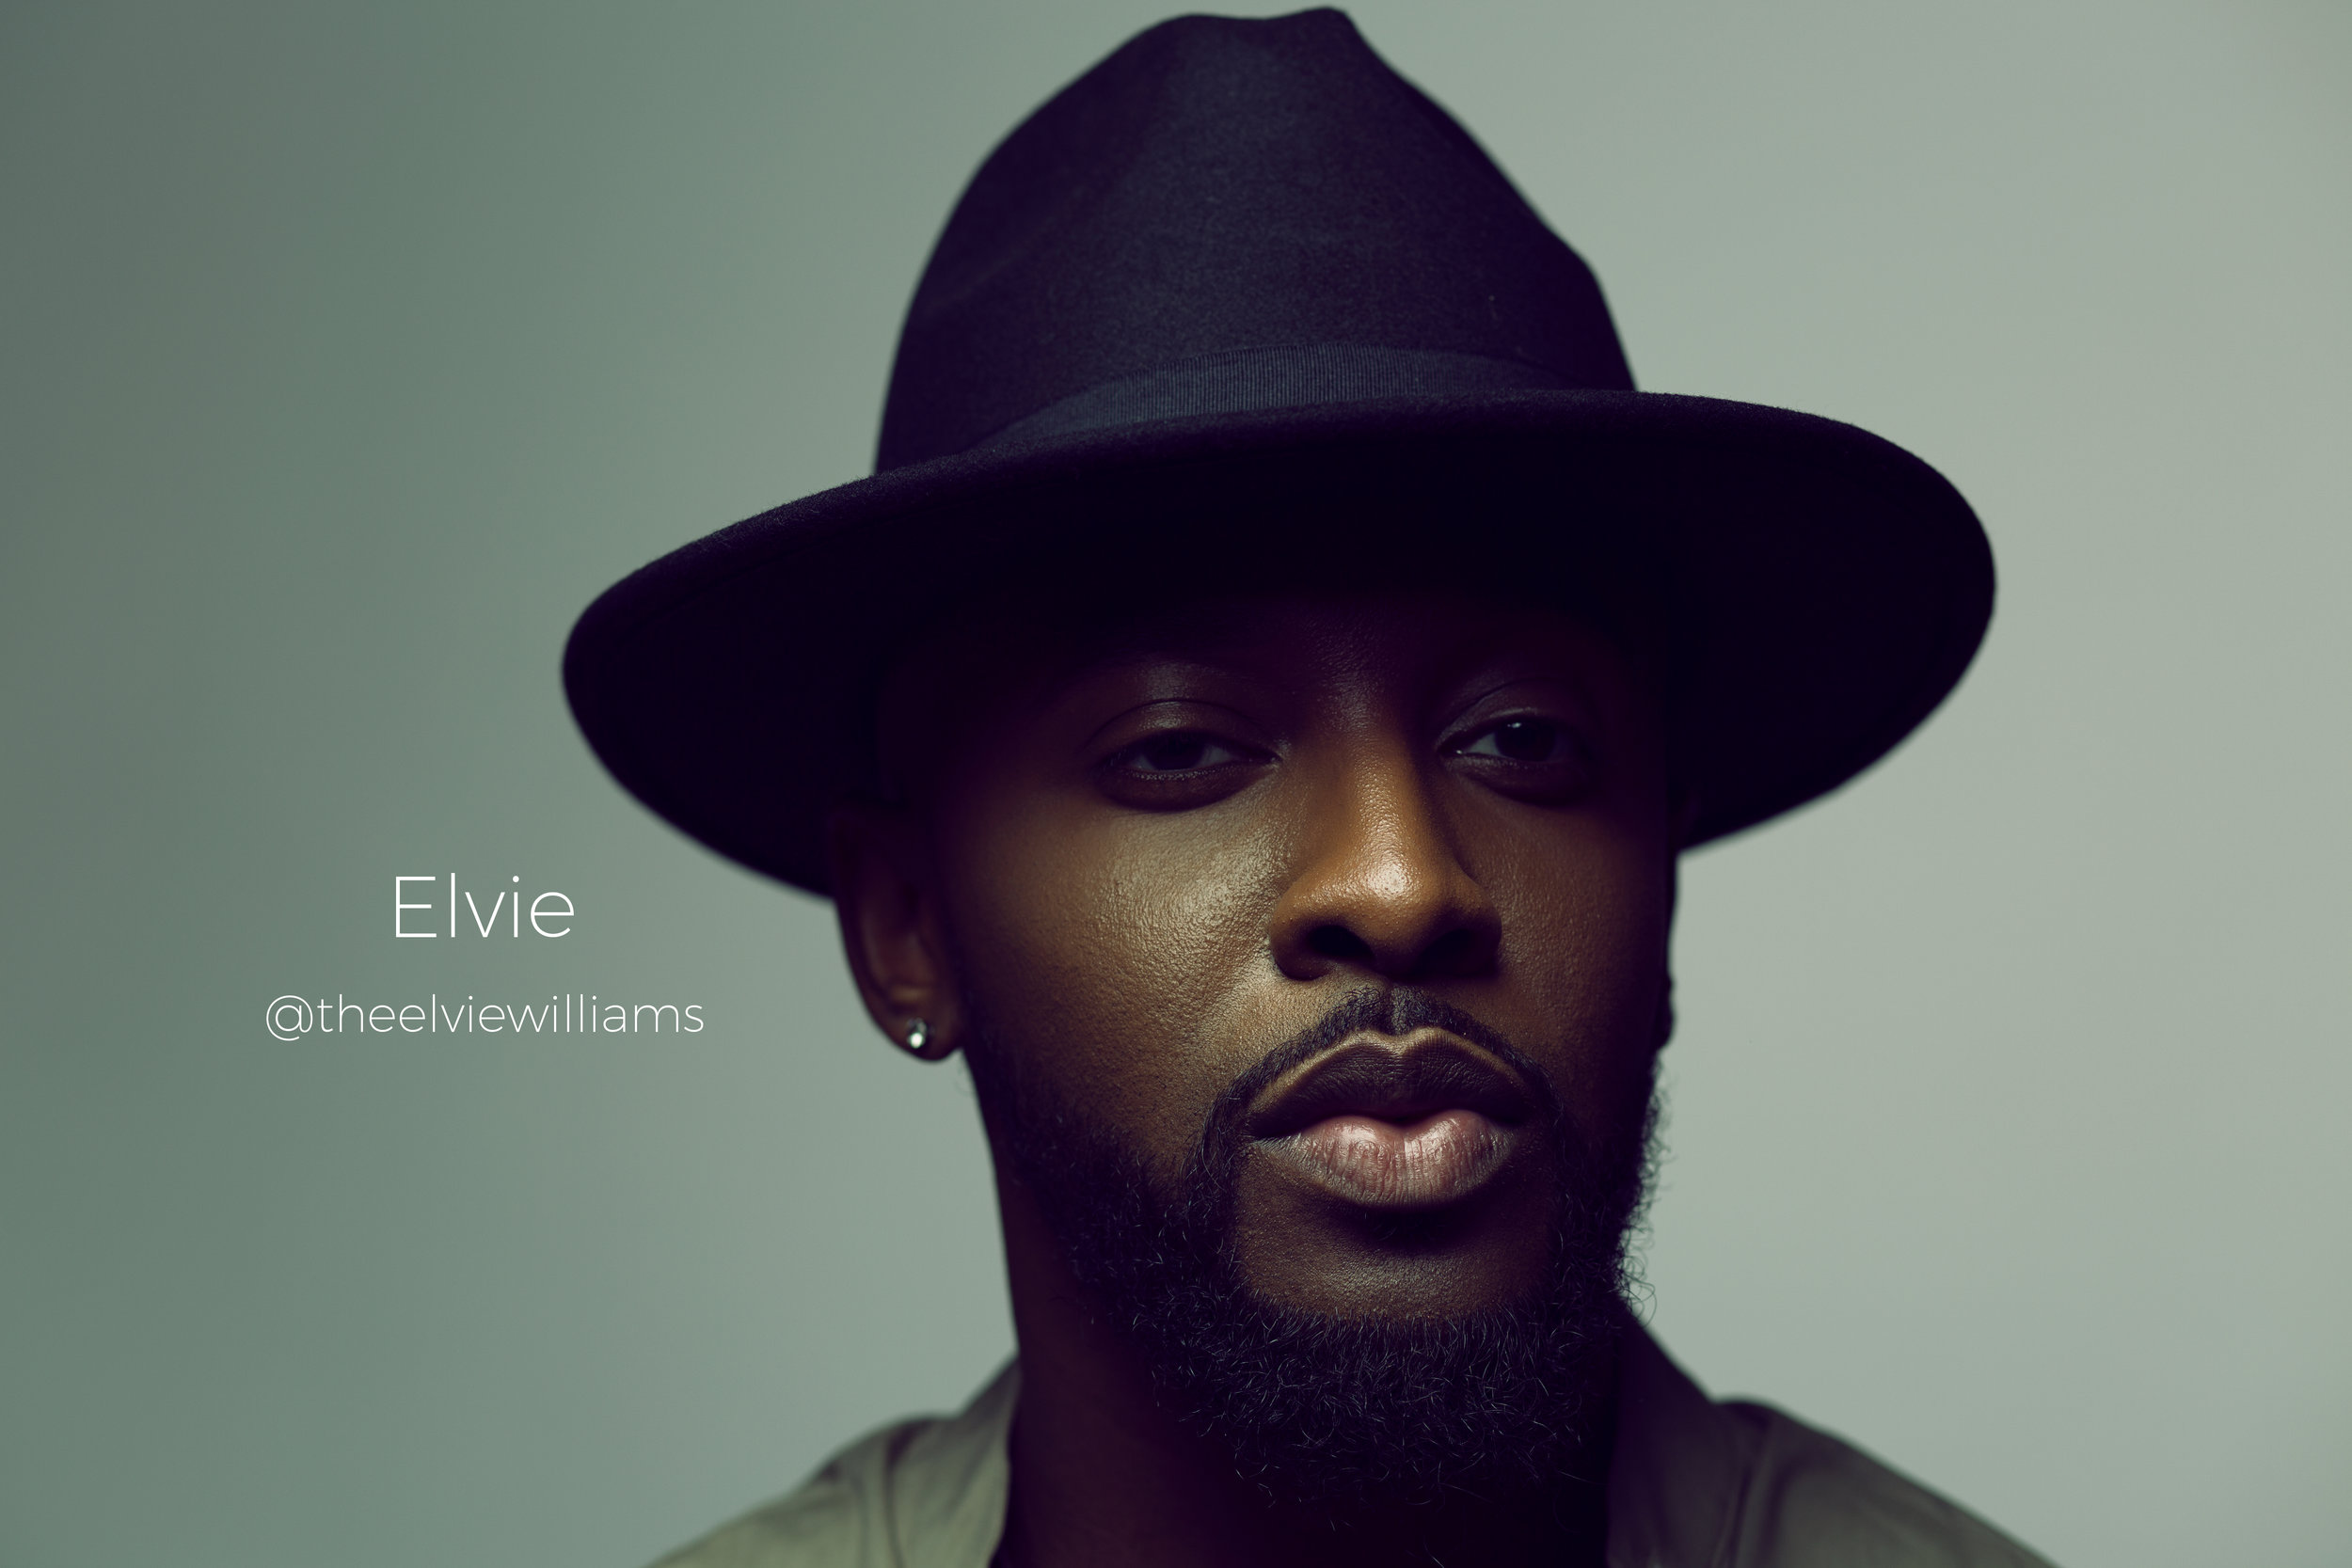 Elvie.jpg